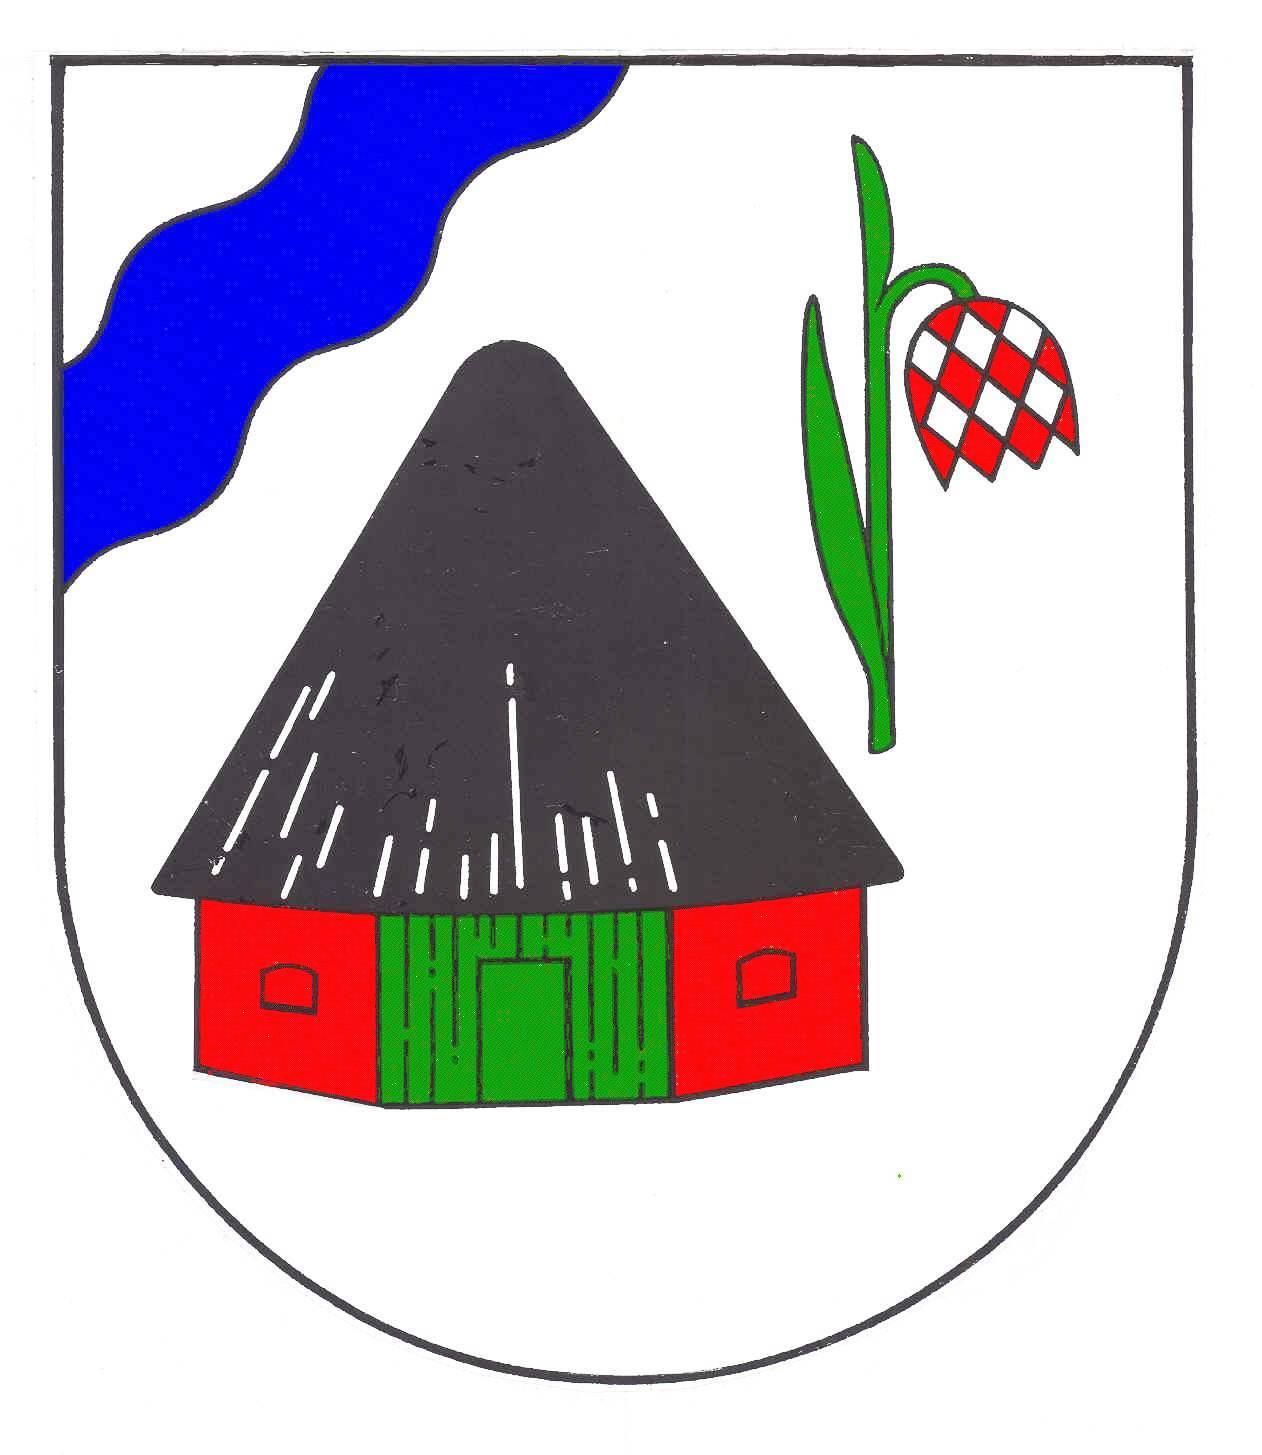 Wappen GemeindeSeestermühe, Kreis Pinneberg